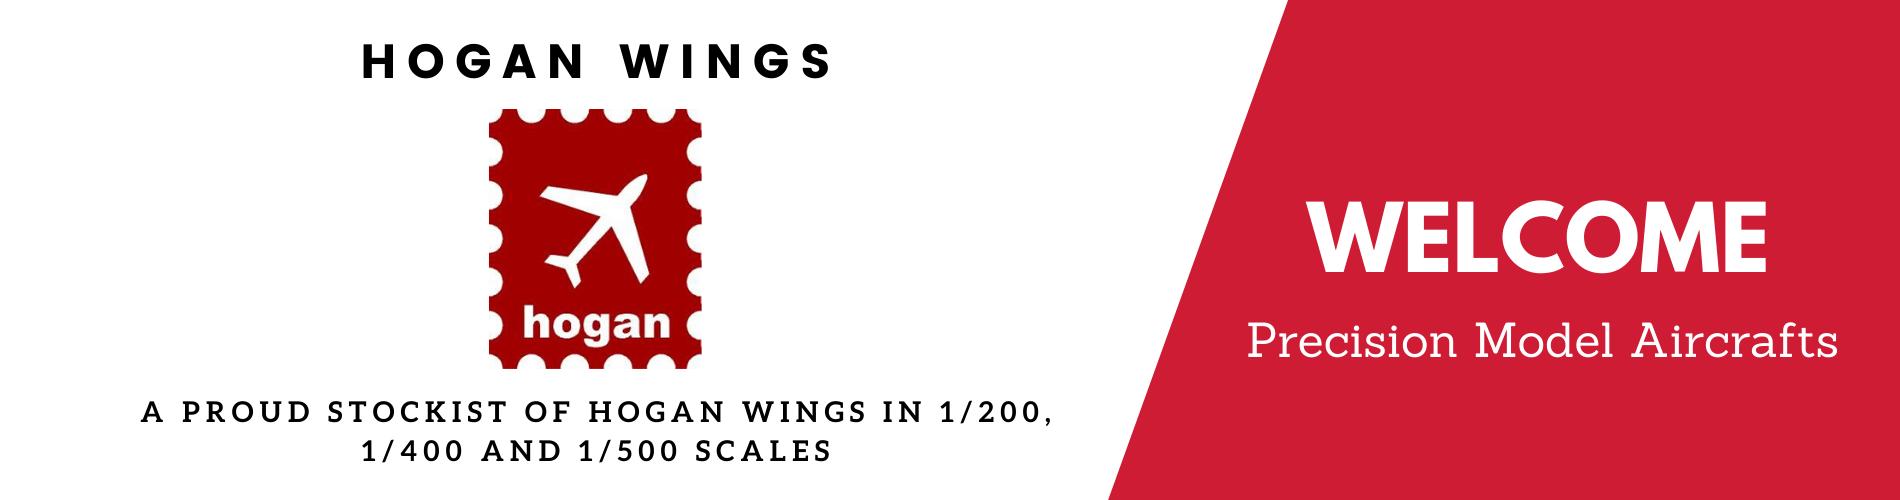 hogan-wings.png